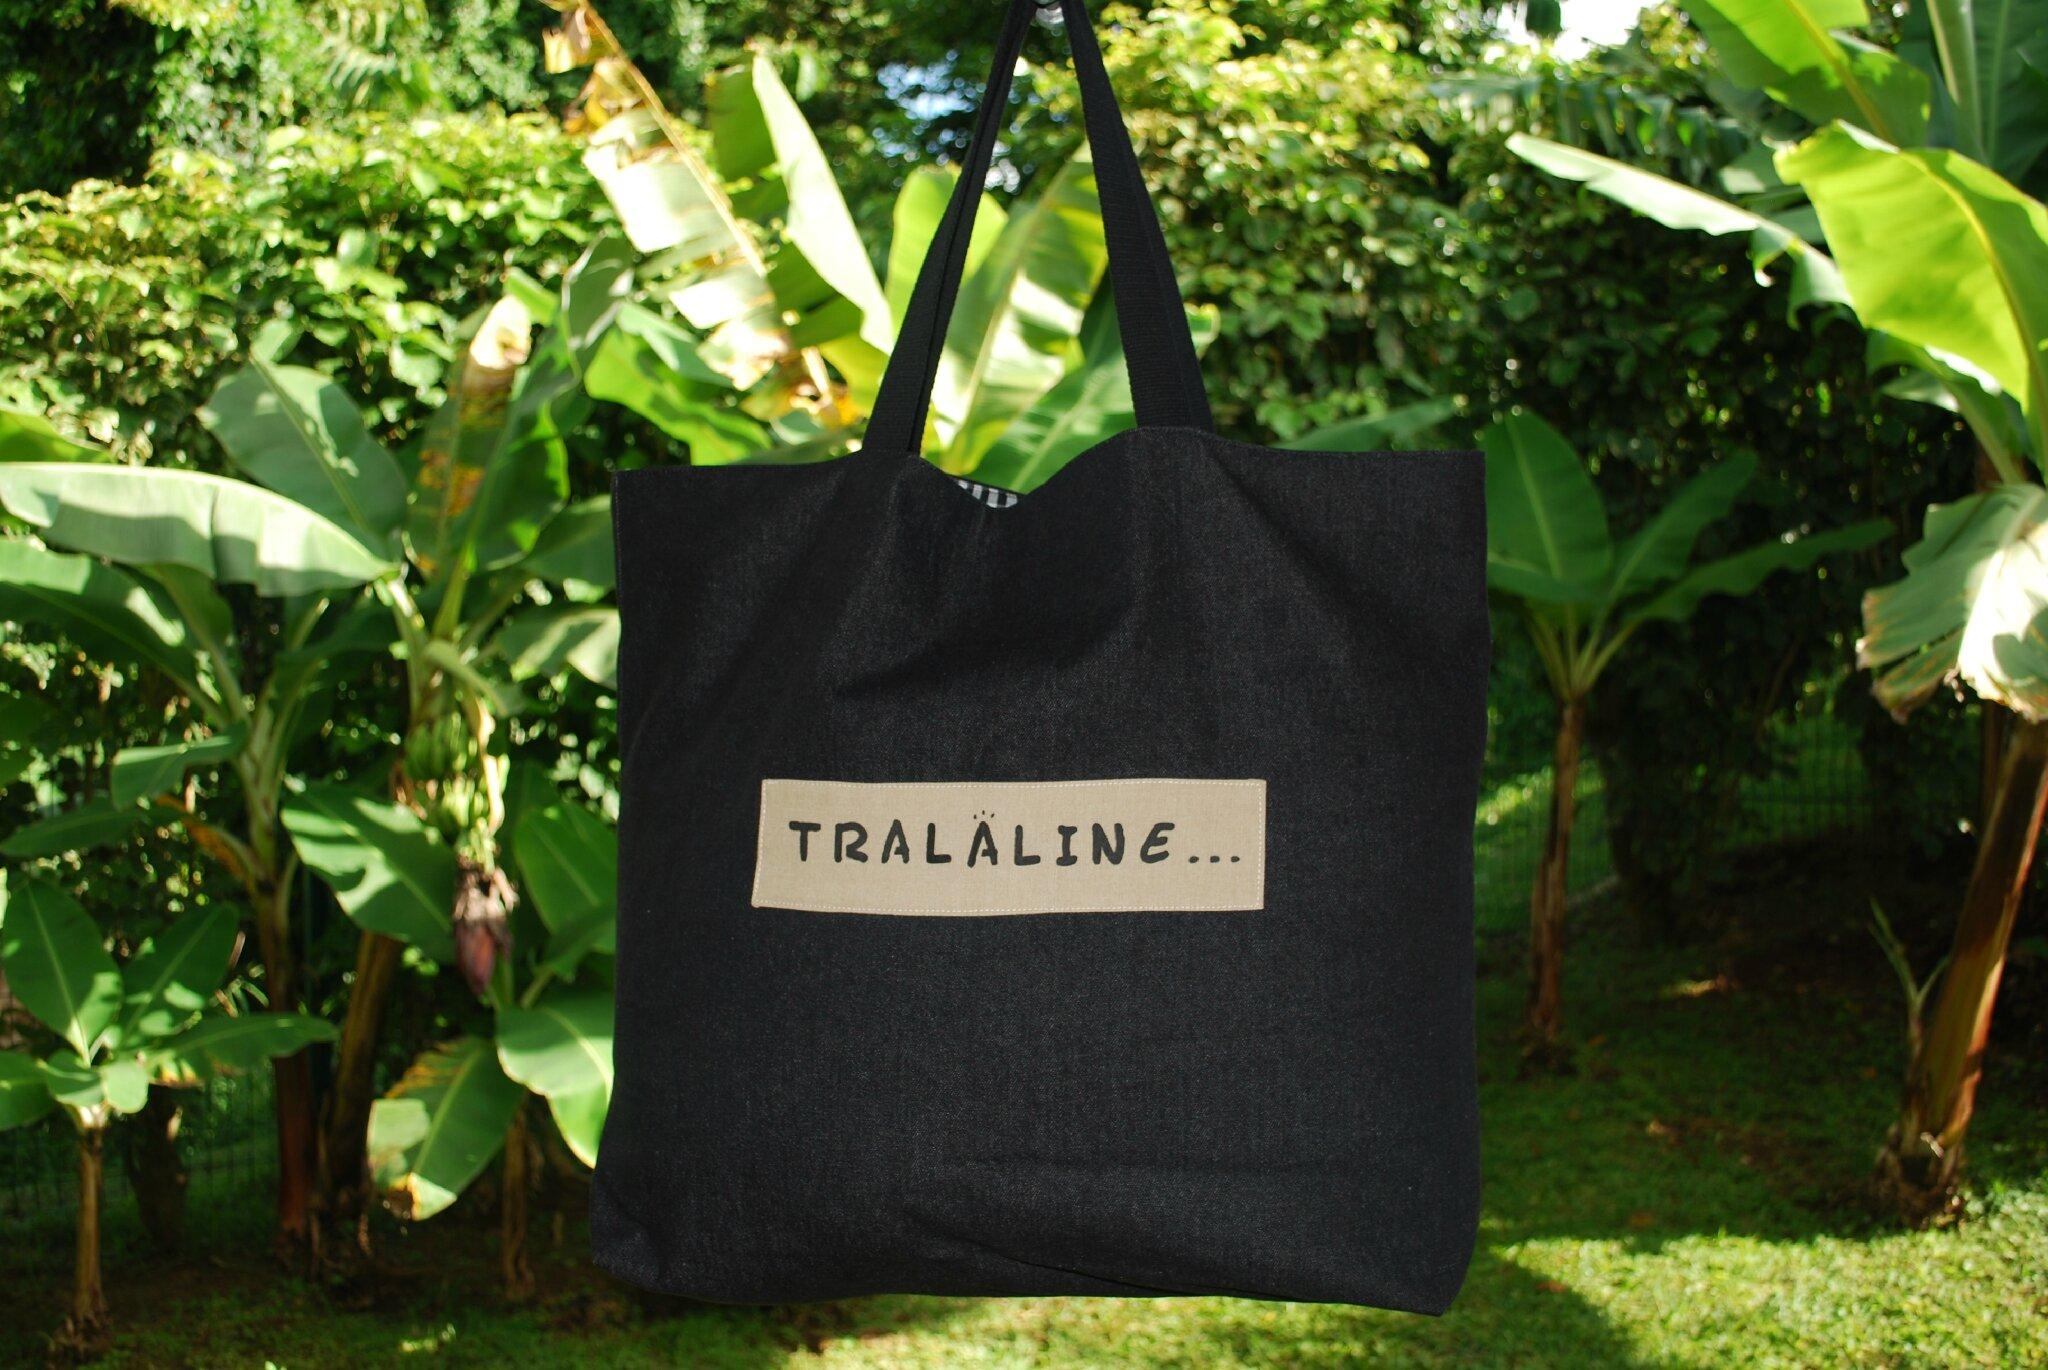 Tralaline